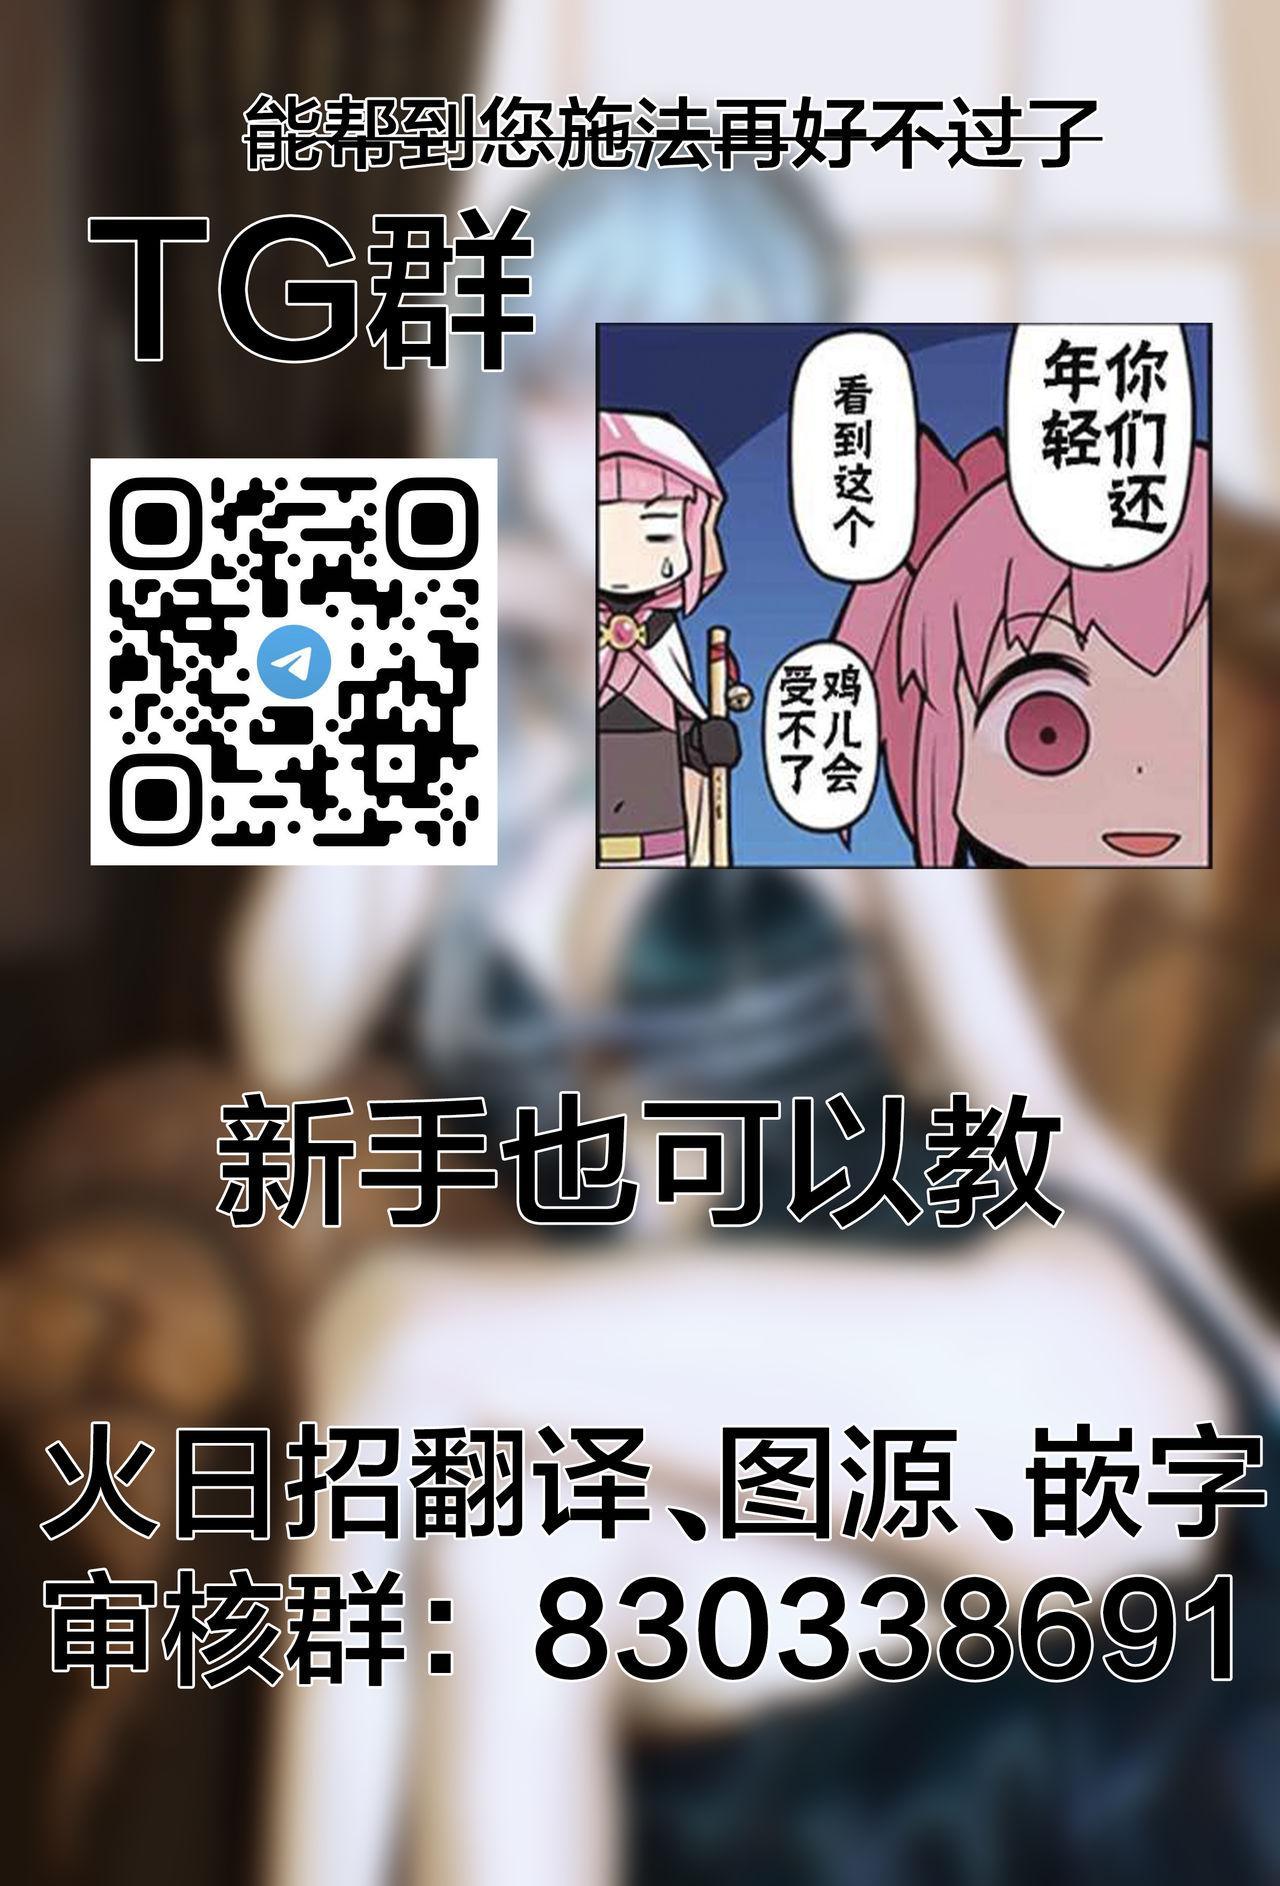 [Sabaku] Miss.Yoruko in midnight (Show your manliness to Yoruko)   「午夜时的夜子小姐「让夜子看看你男人的一面」」(COMIC LO 2021-06) [Chinese] [Digital] 29